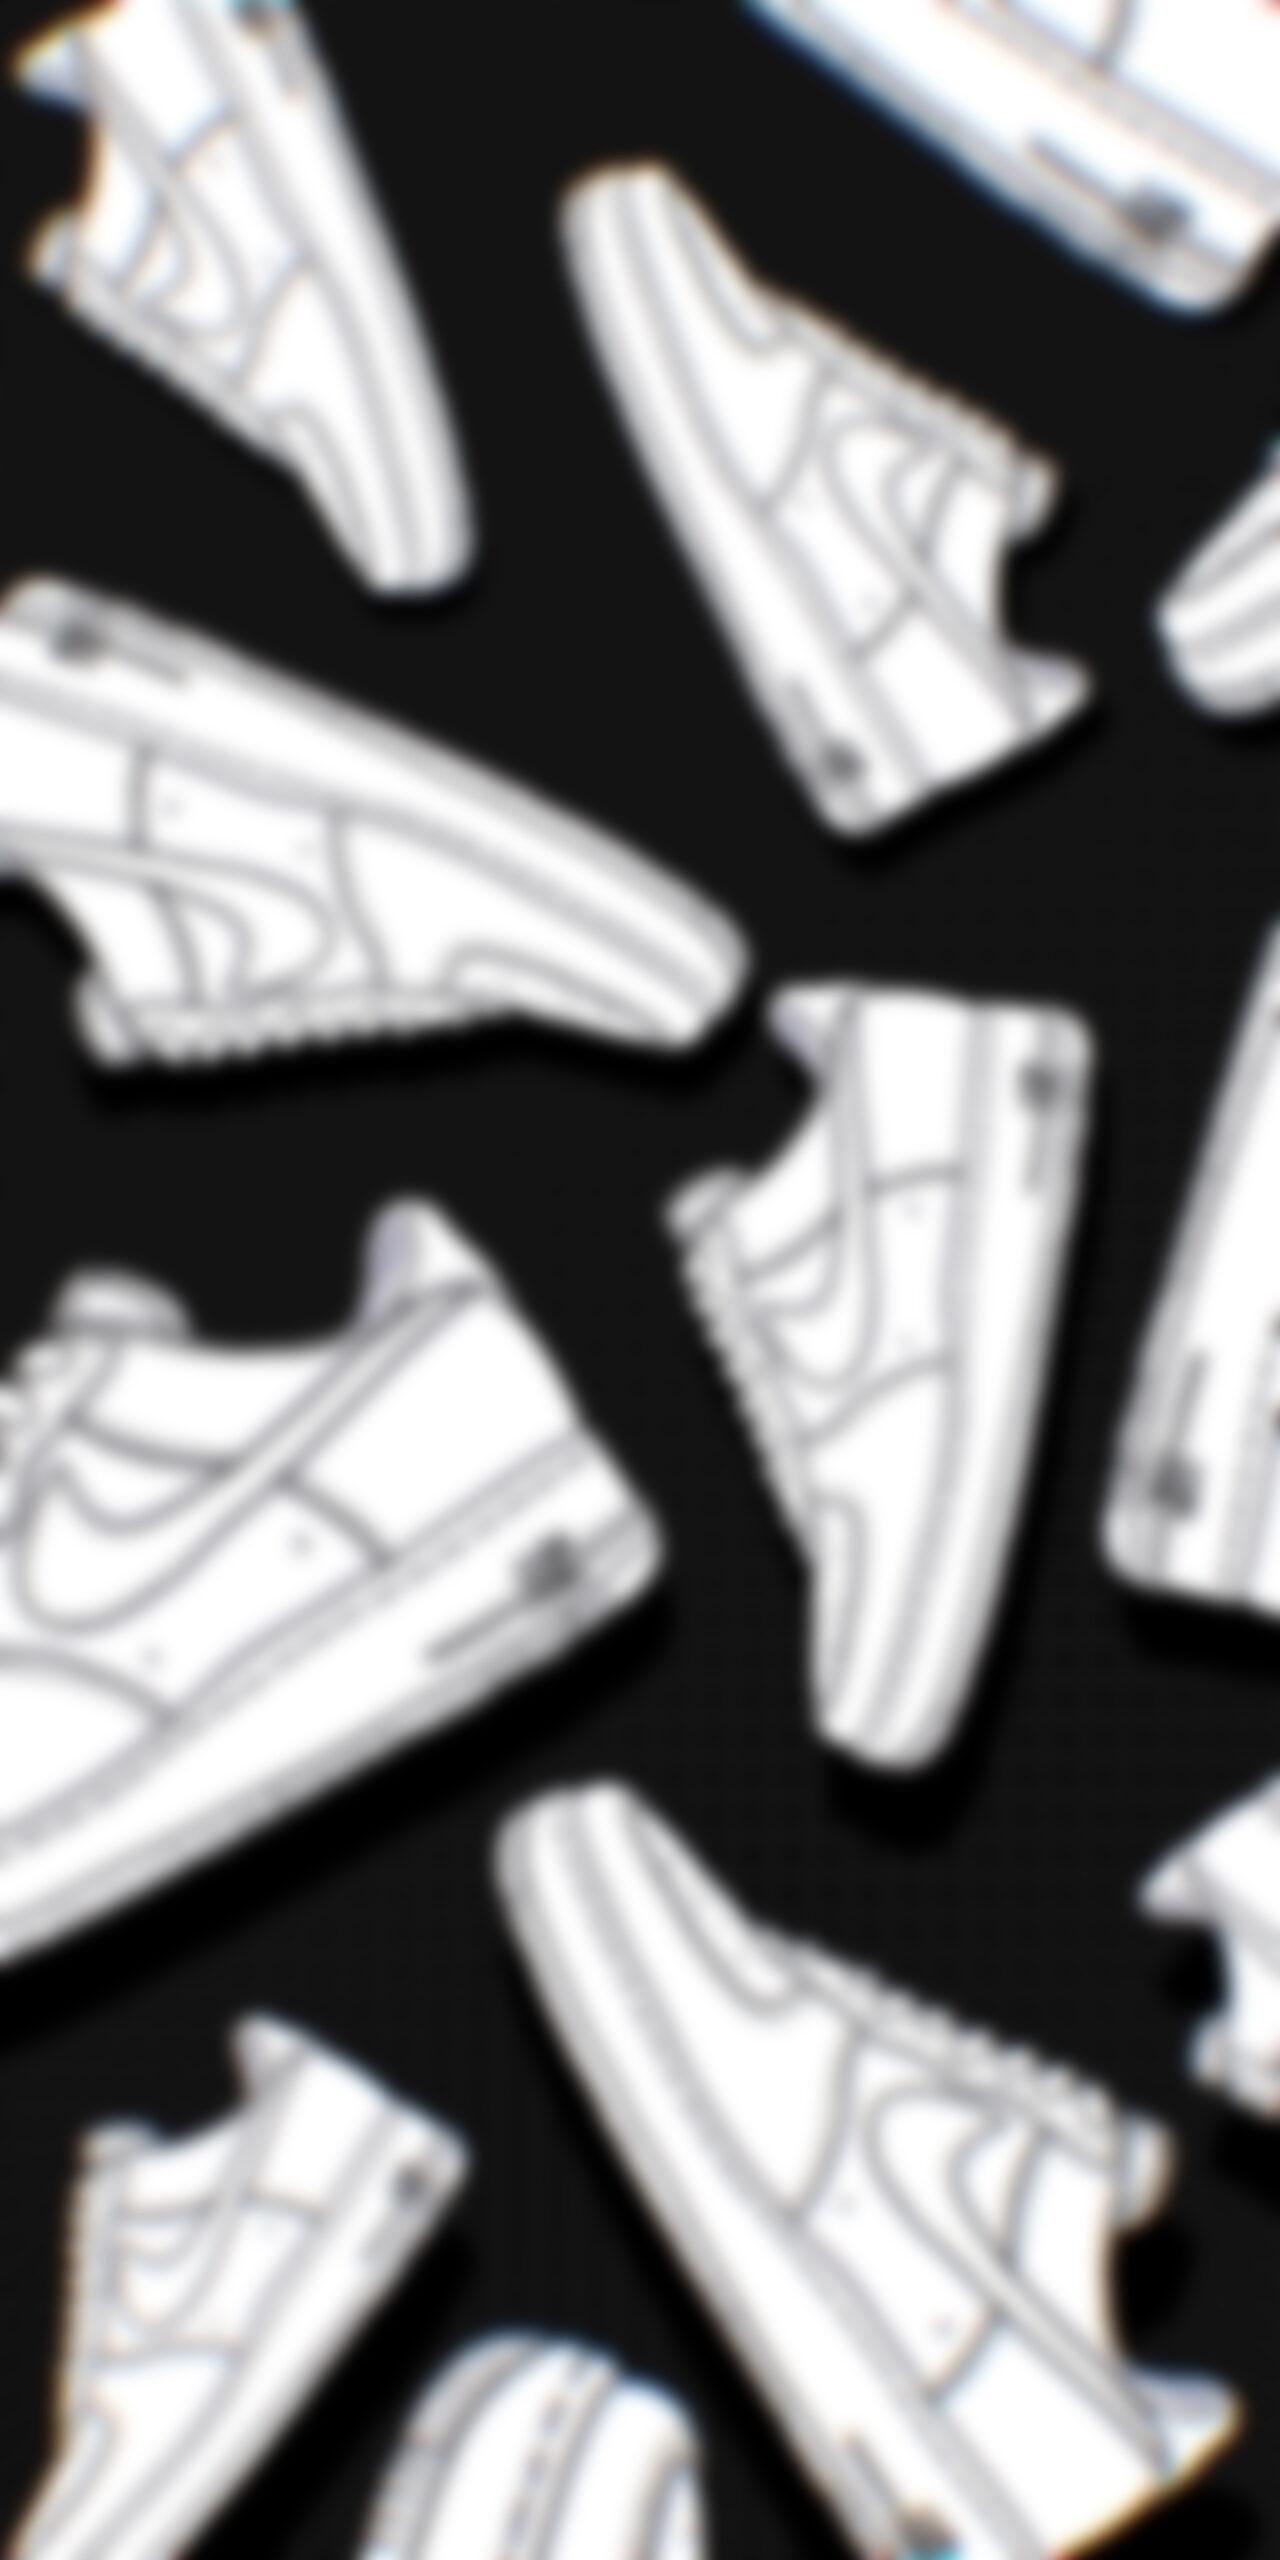 nike air force 1 shoes white black blur wallpaper